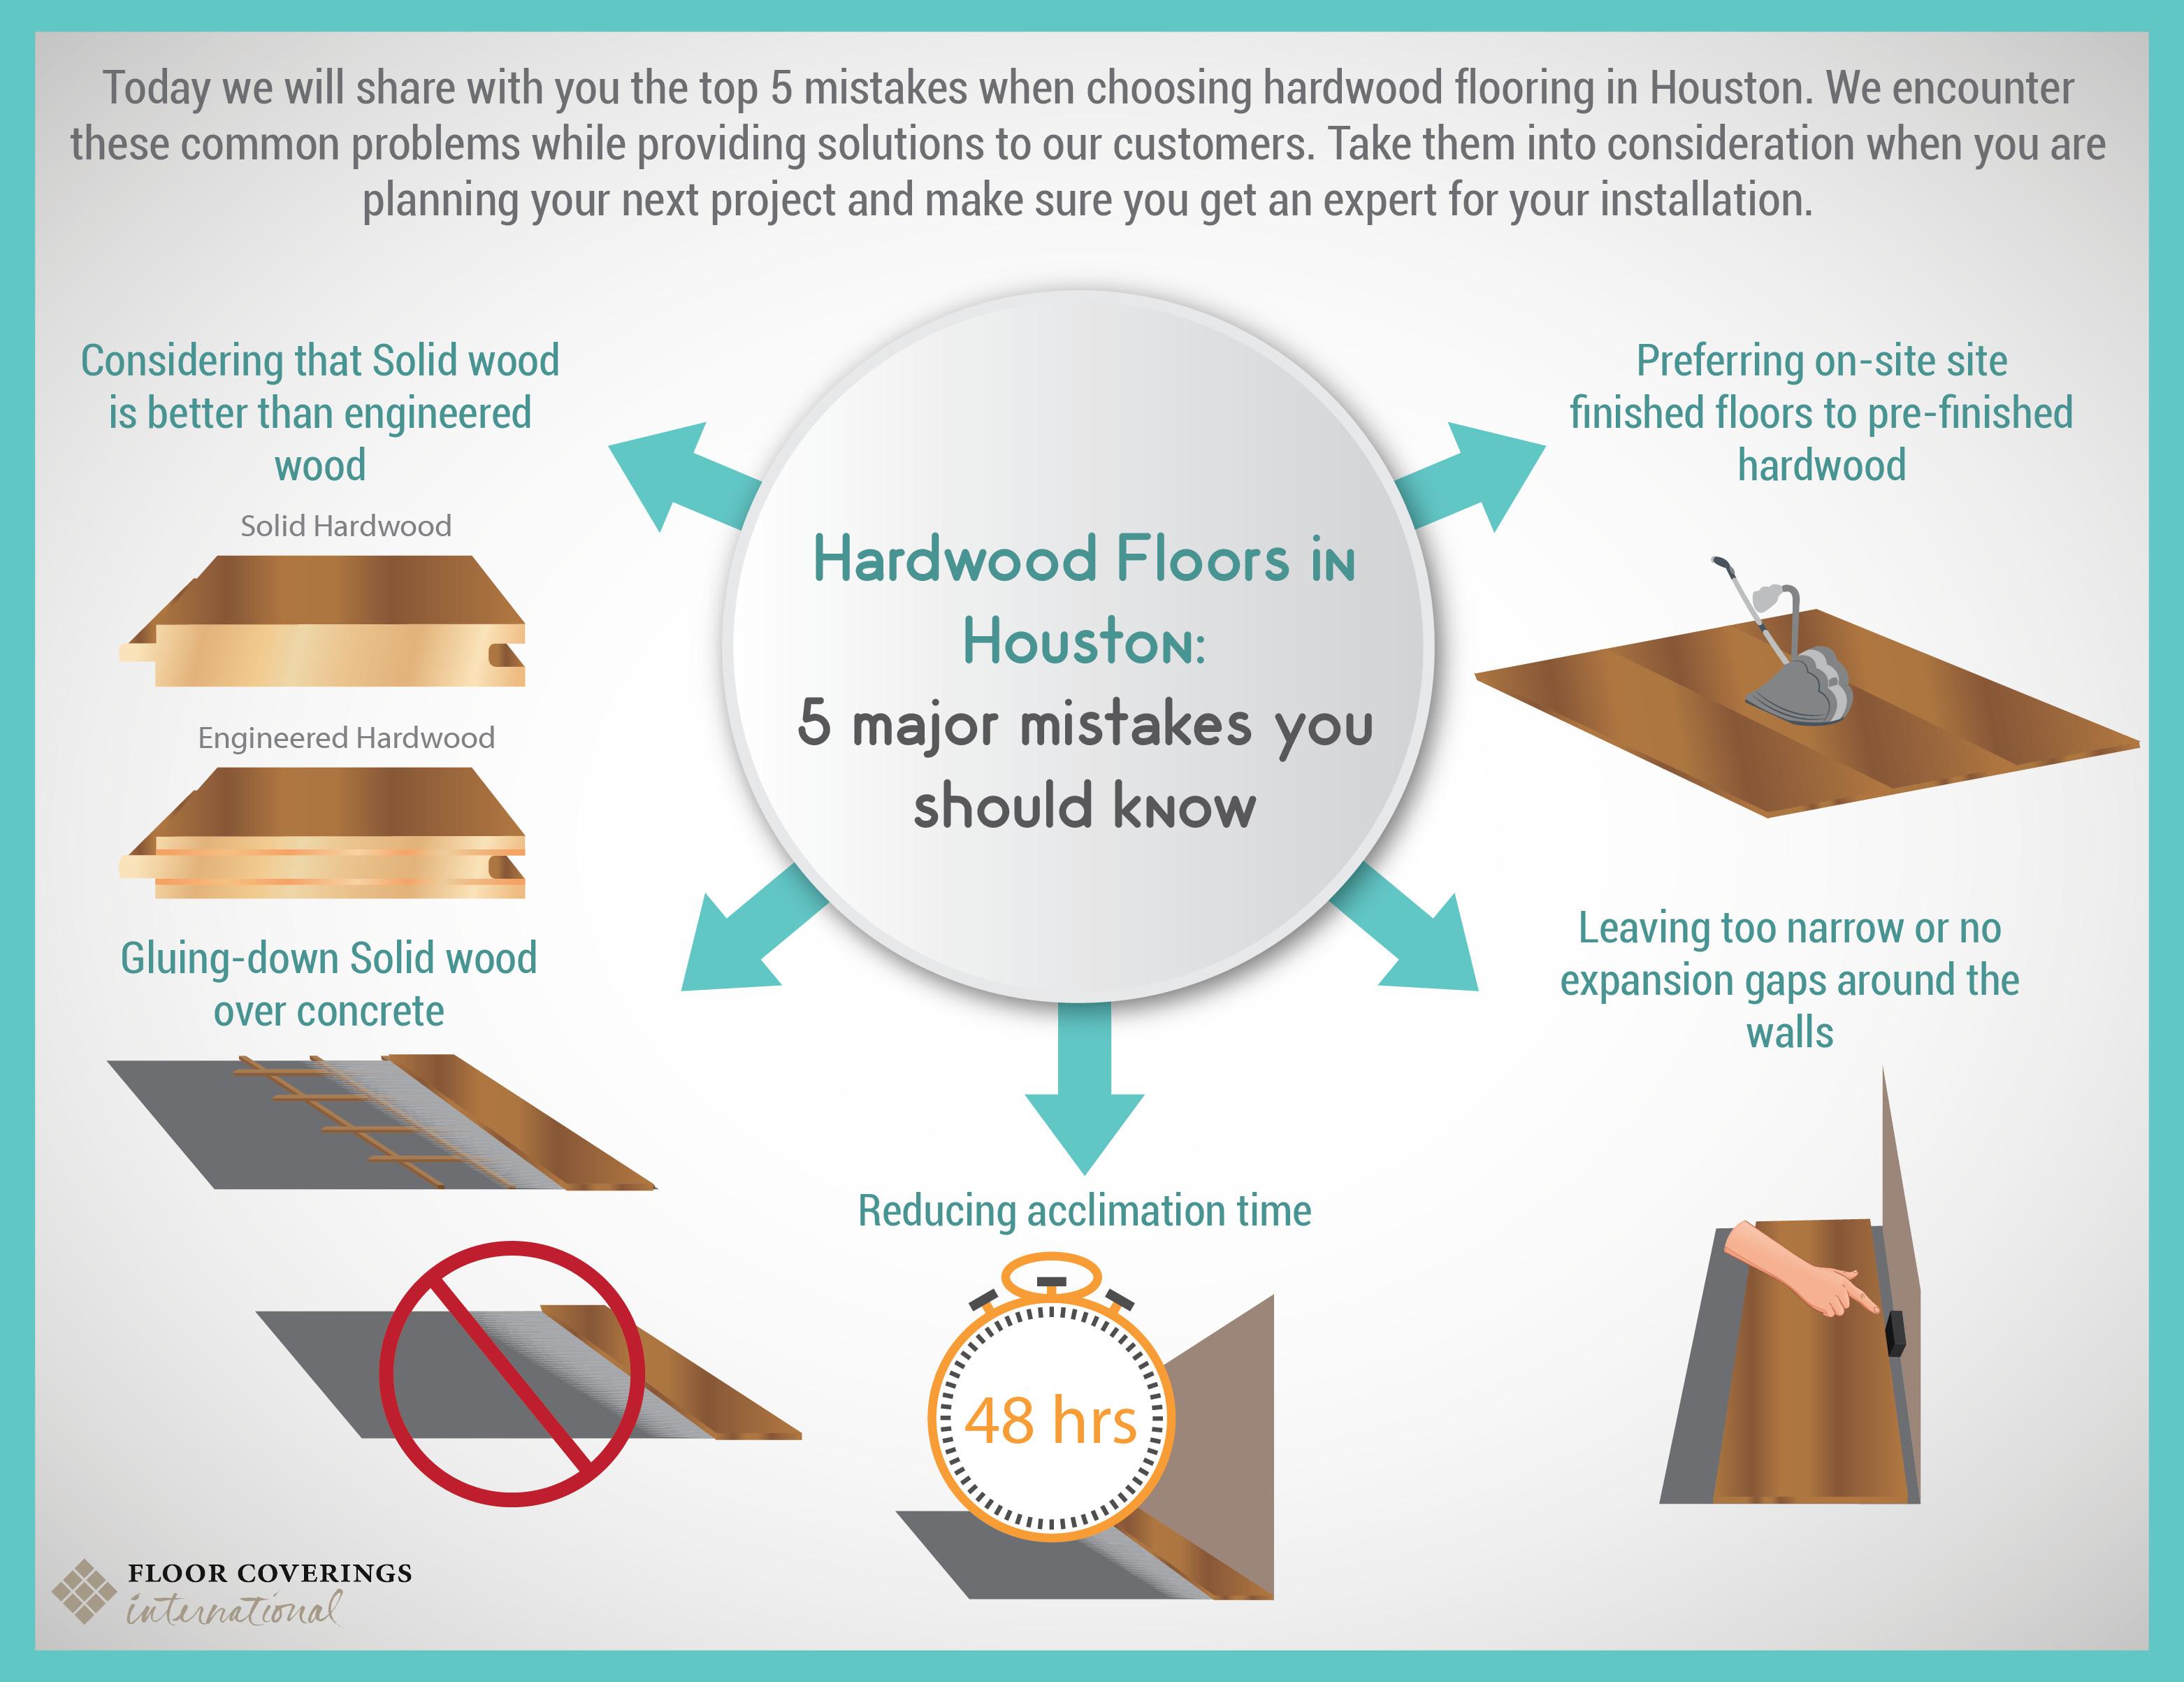 hardwood floor refinishing specialists houston tx of hardwood flooring houston pertaining to five mistakes for hardwood flooring in houston